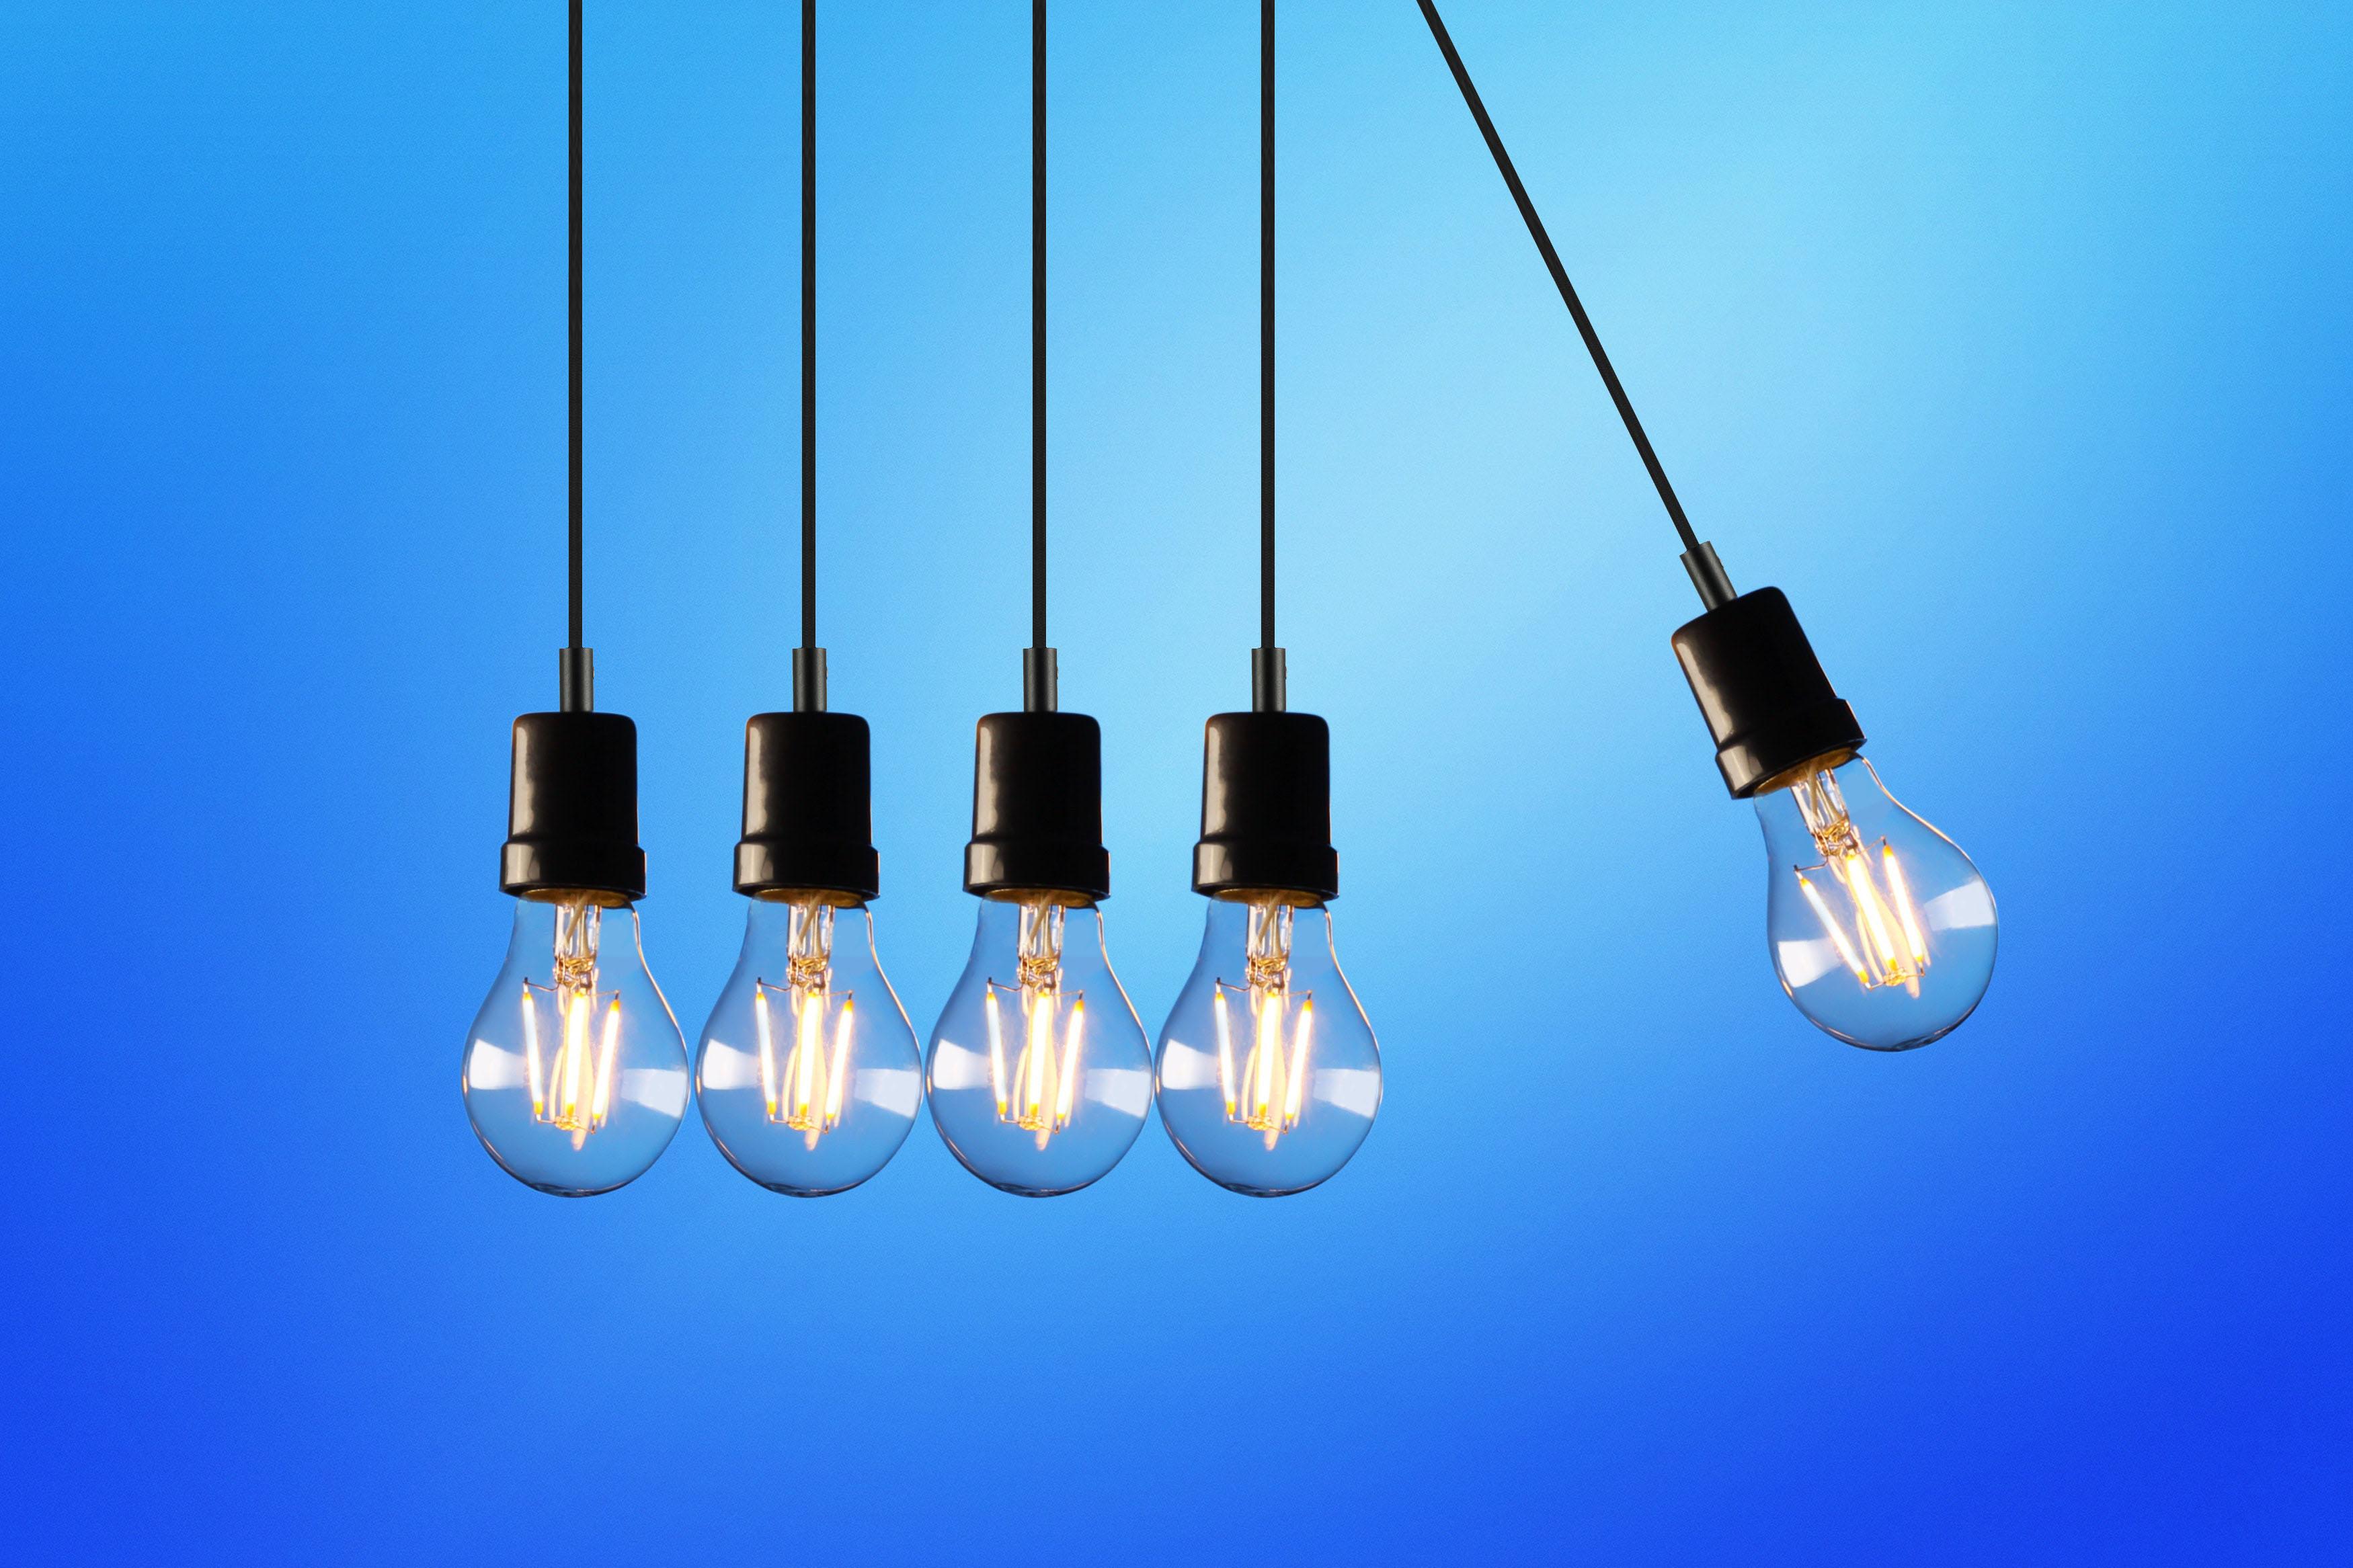 five-bulb-lights-1036936.jpg